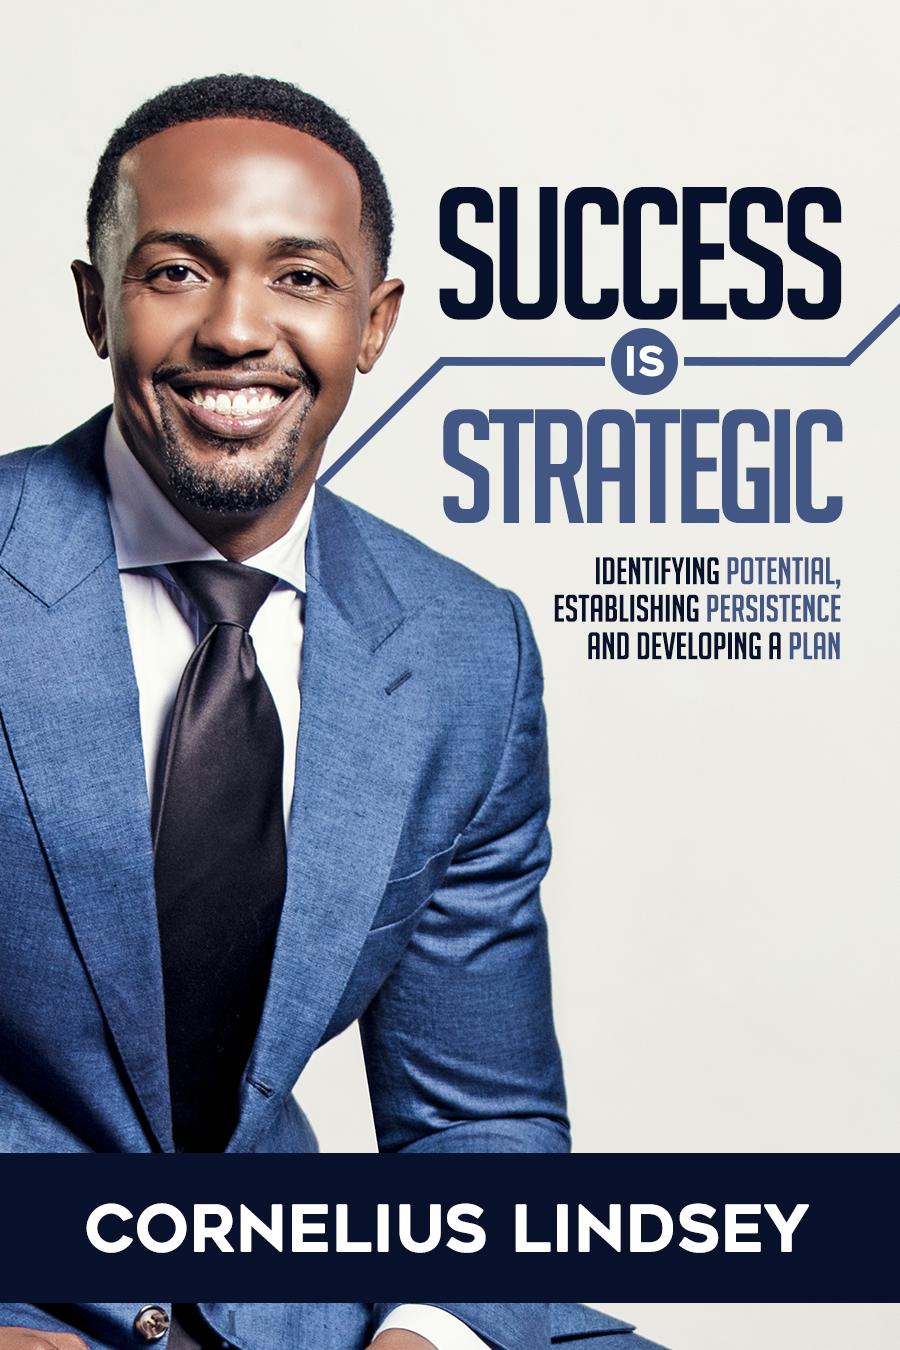 success_book cover_s1.jpg